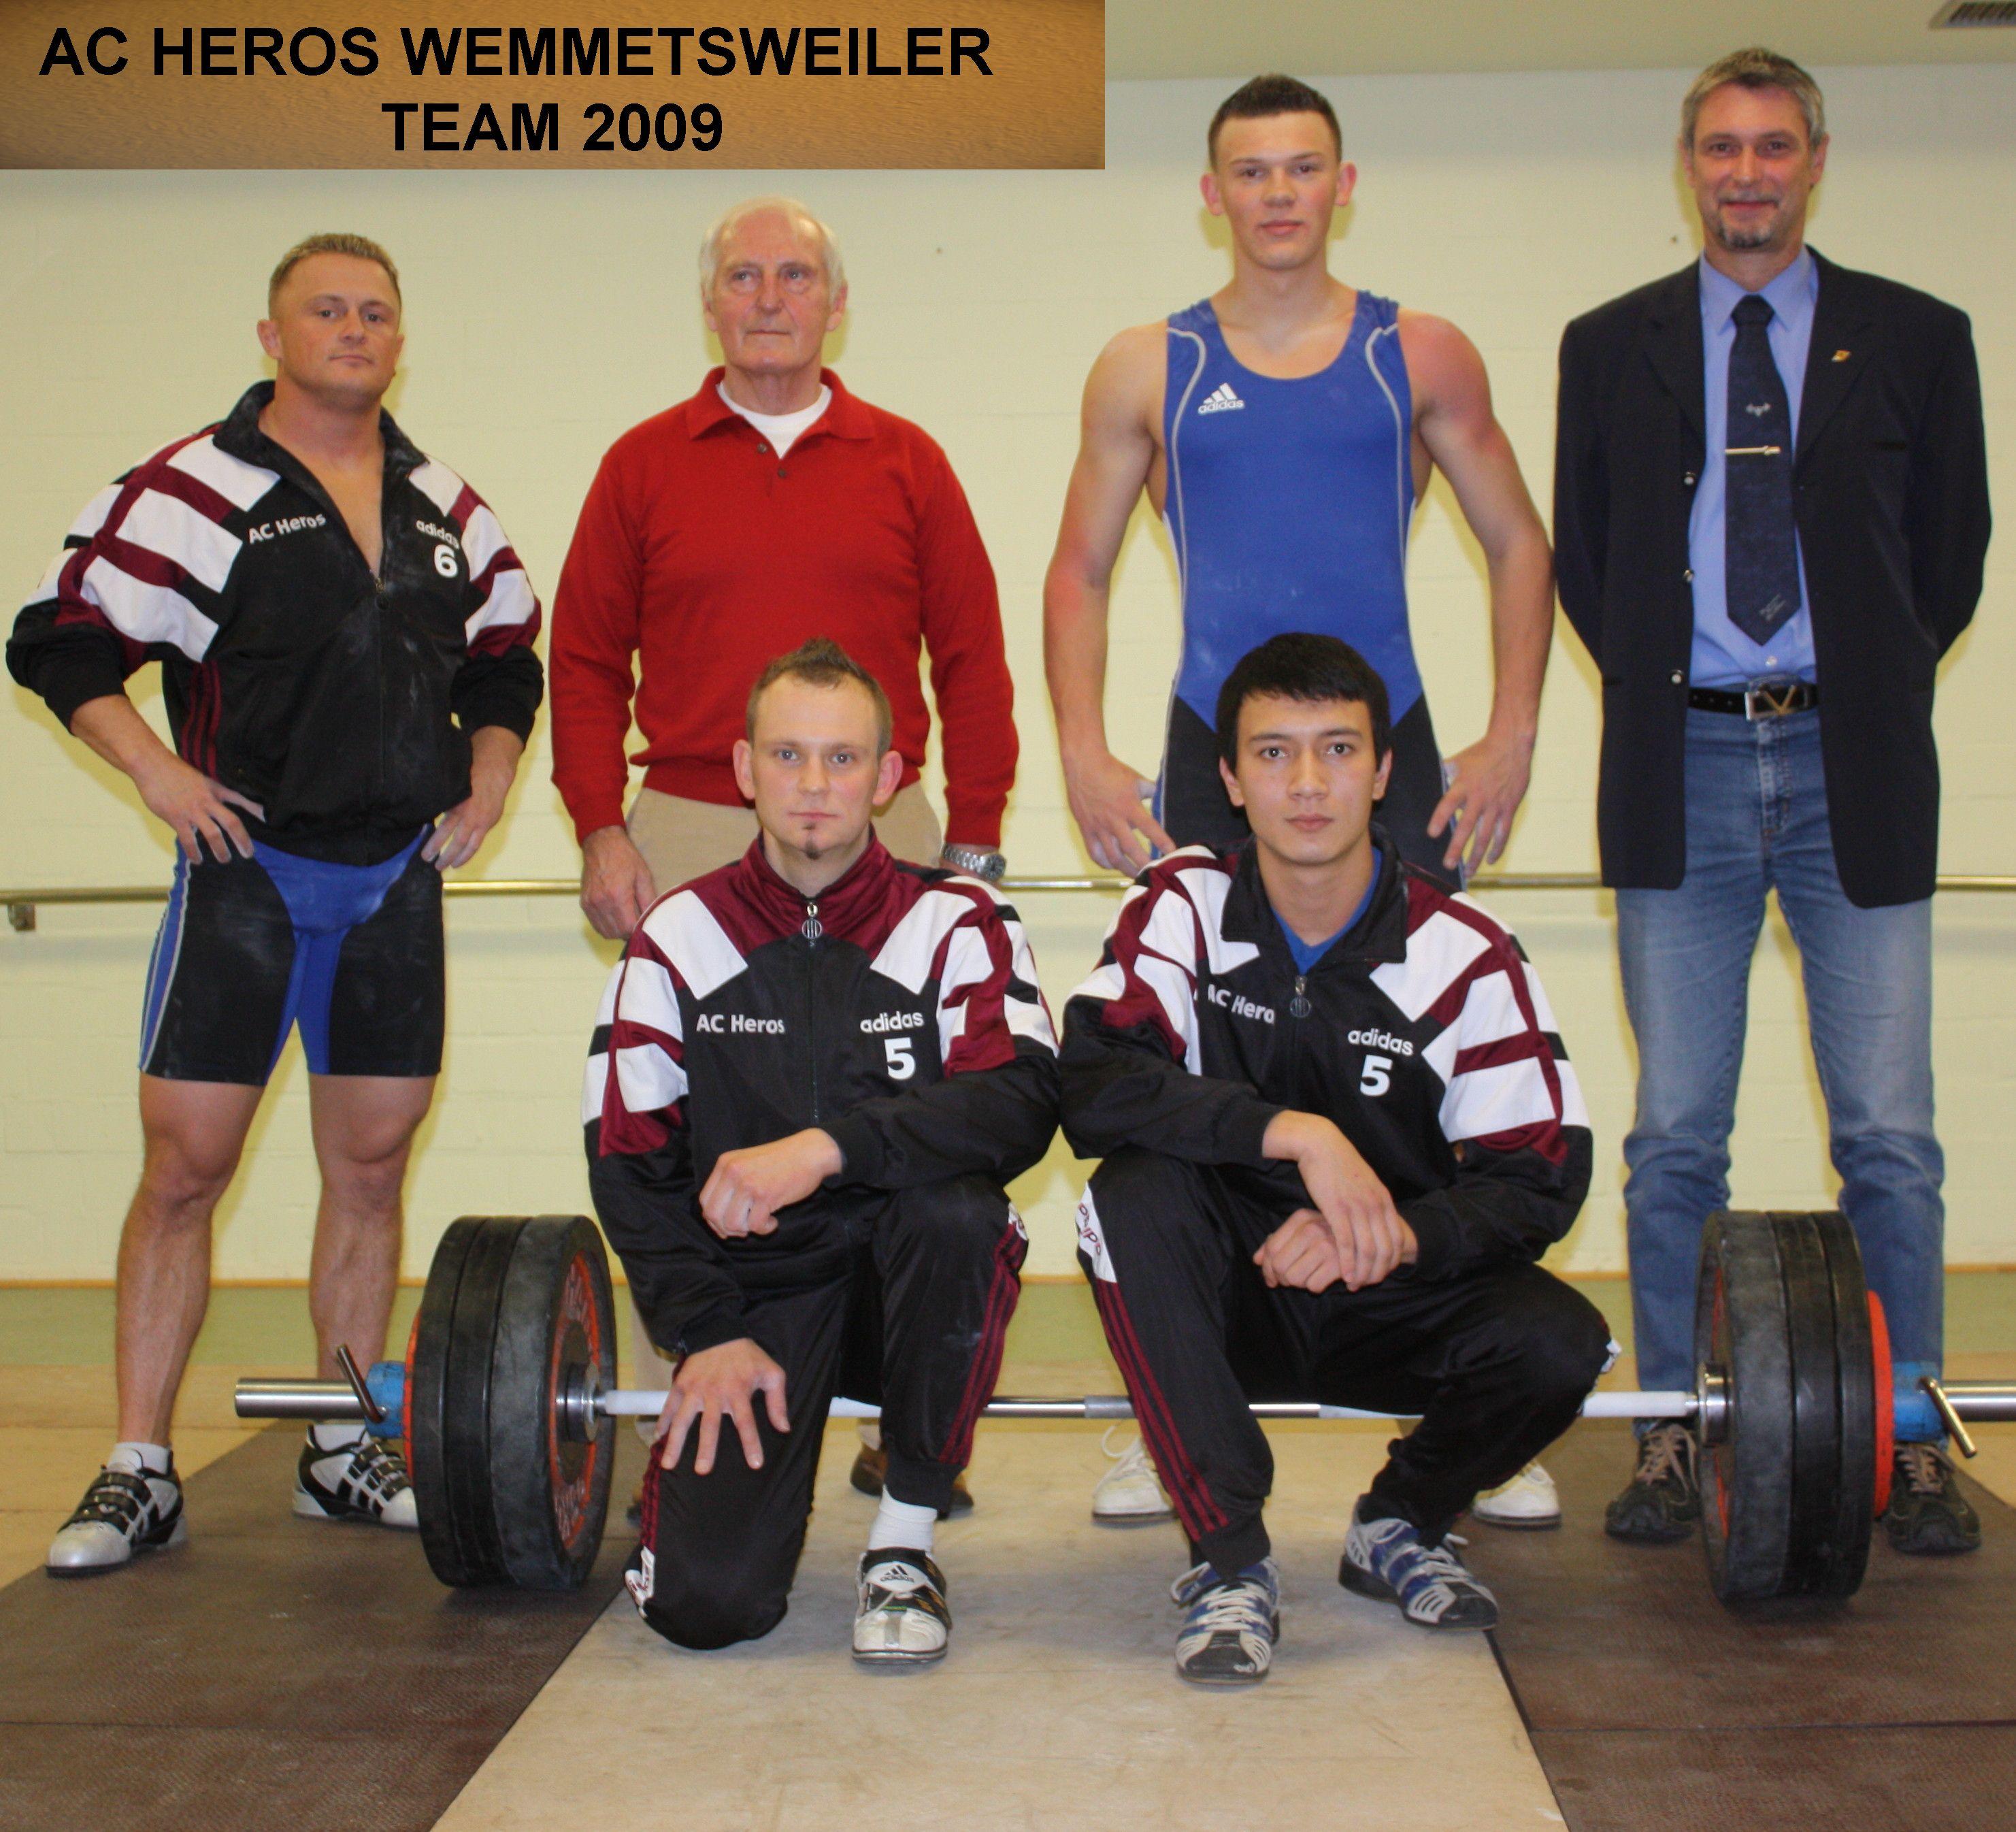 FOTO 1  Team 2009